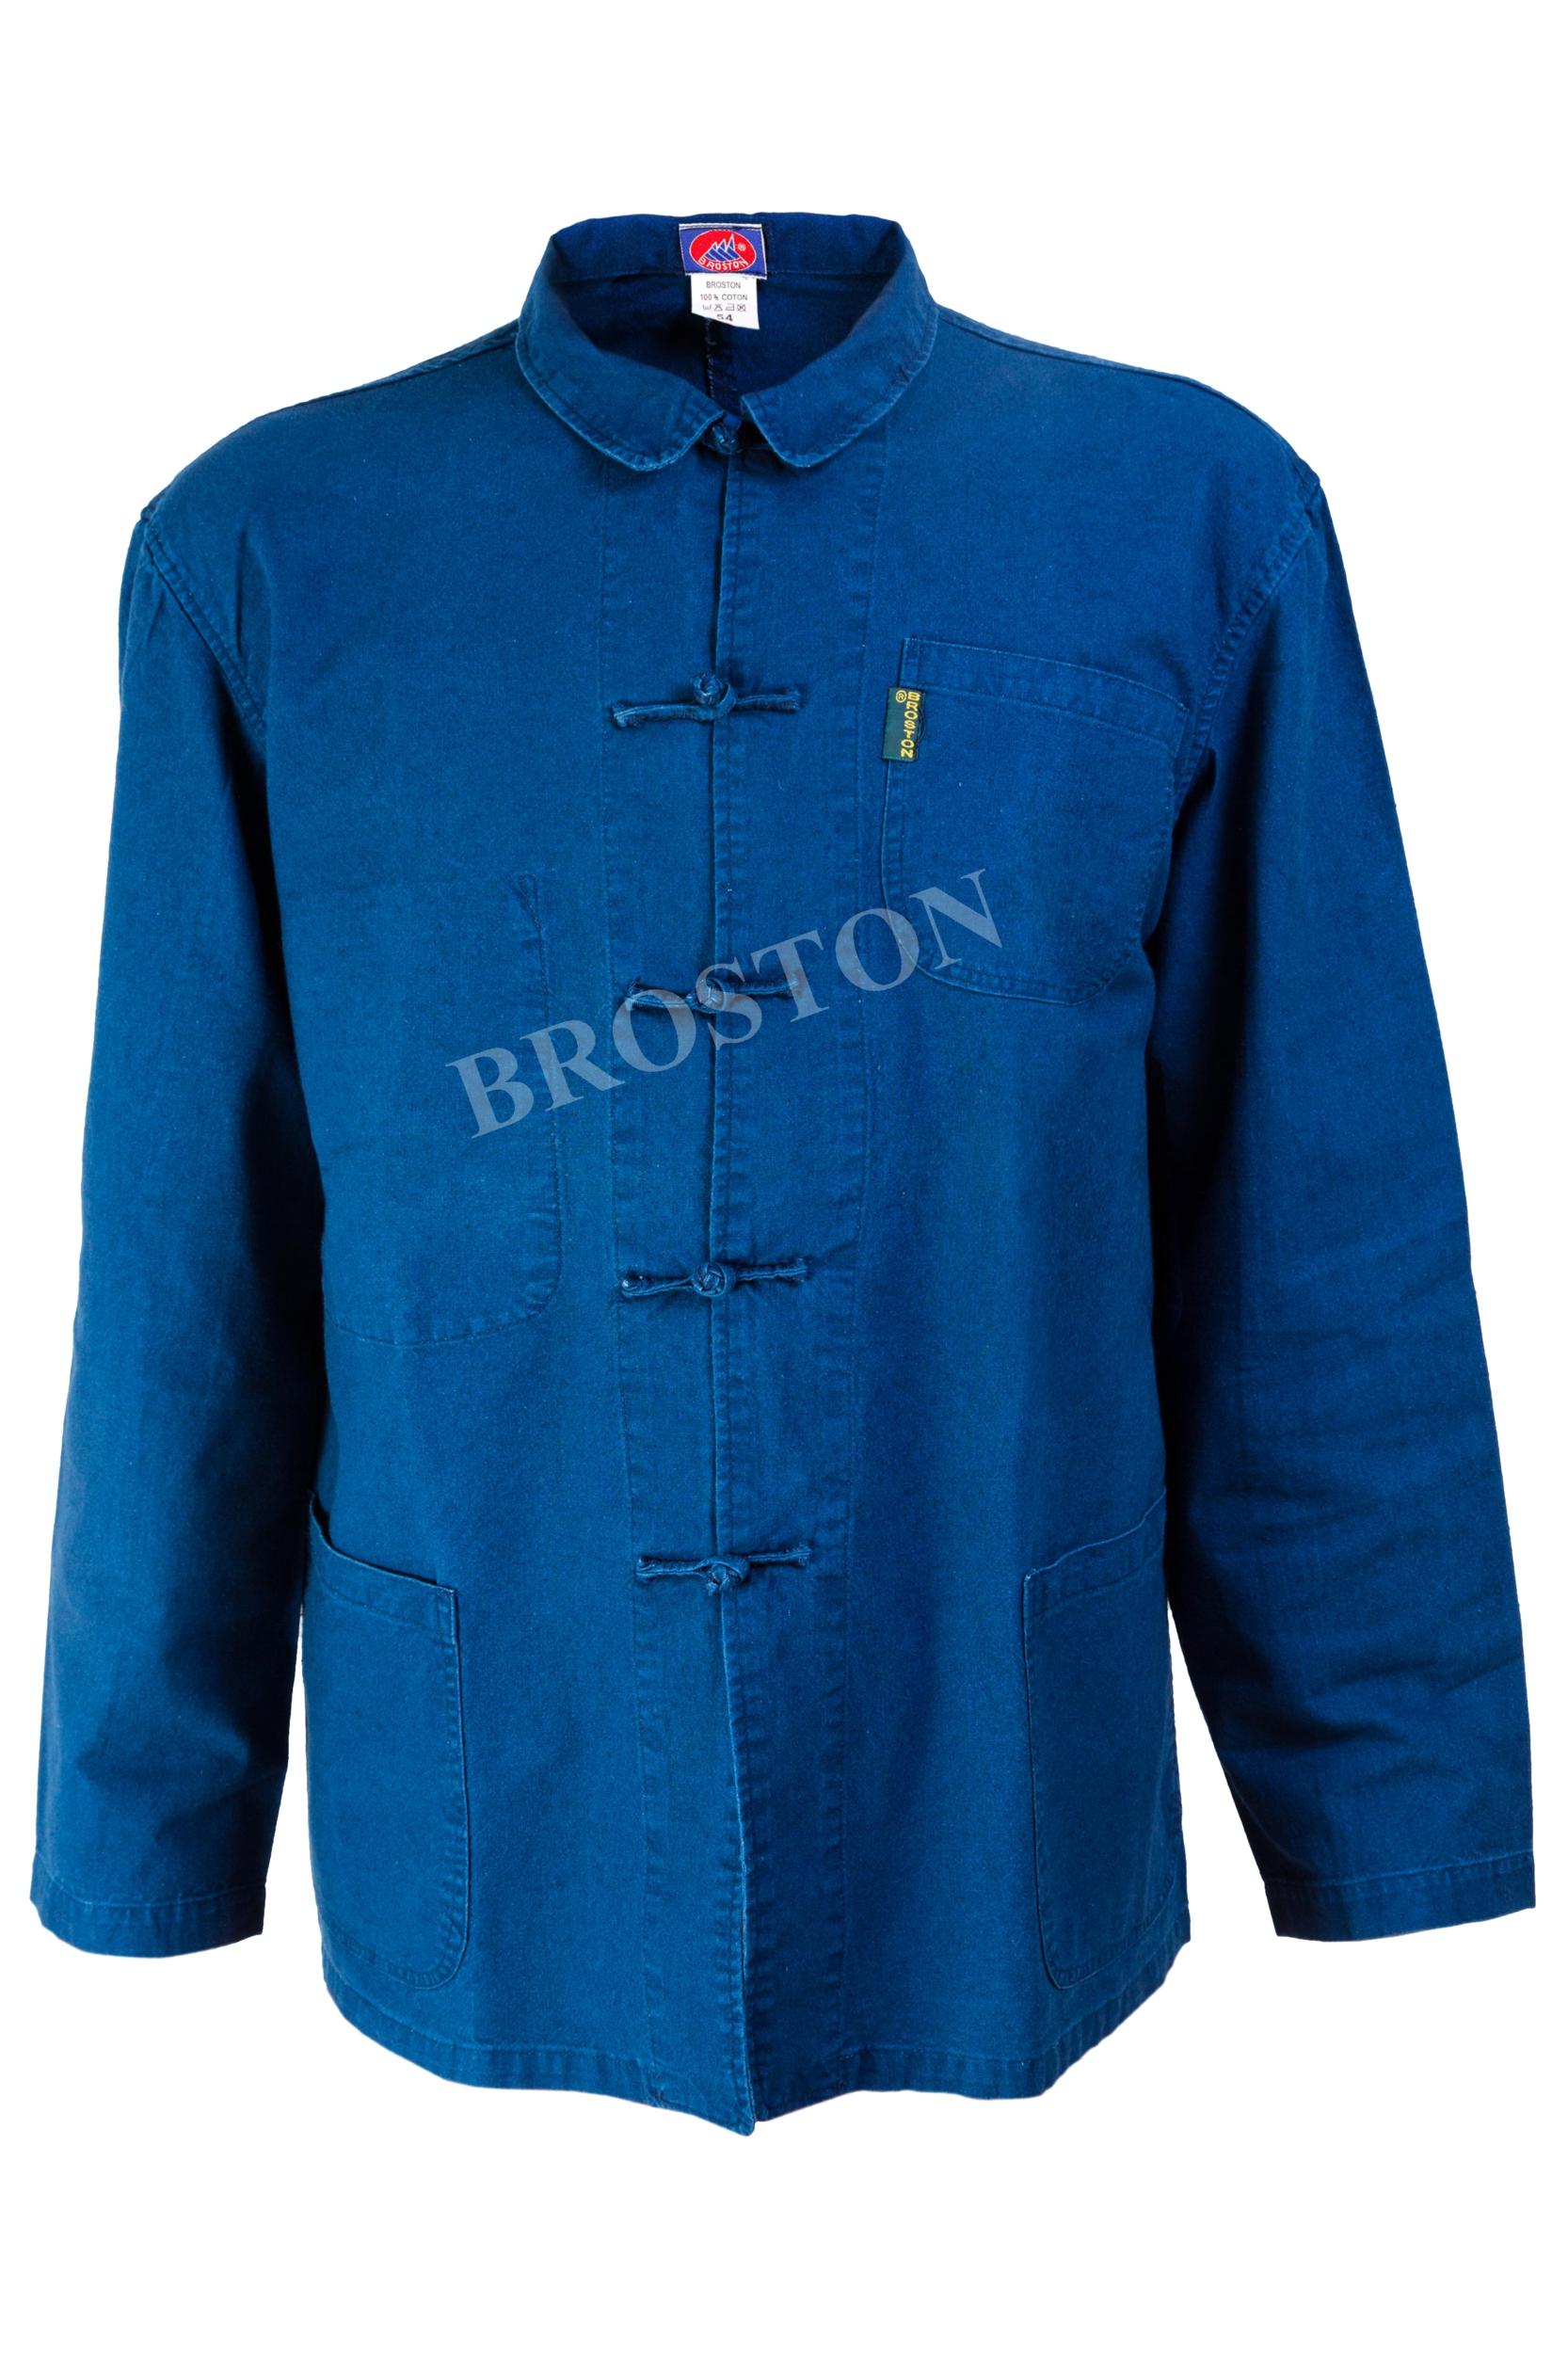 veste bleu de chine broston mode marine top pro. Black Bedroom Furniture Sets. Home Design Ideas